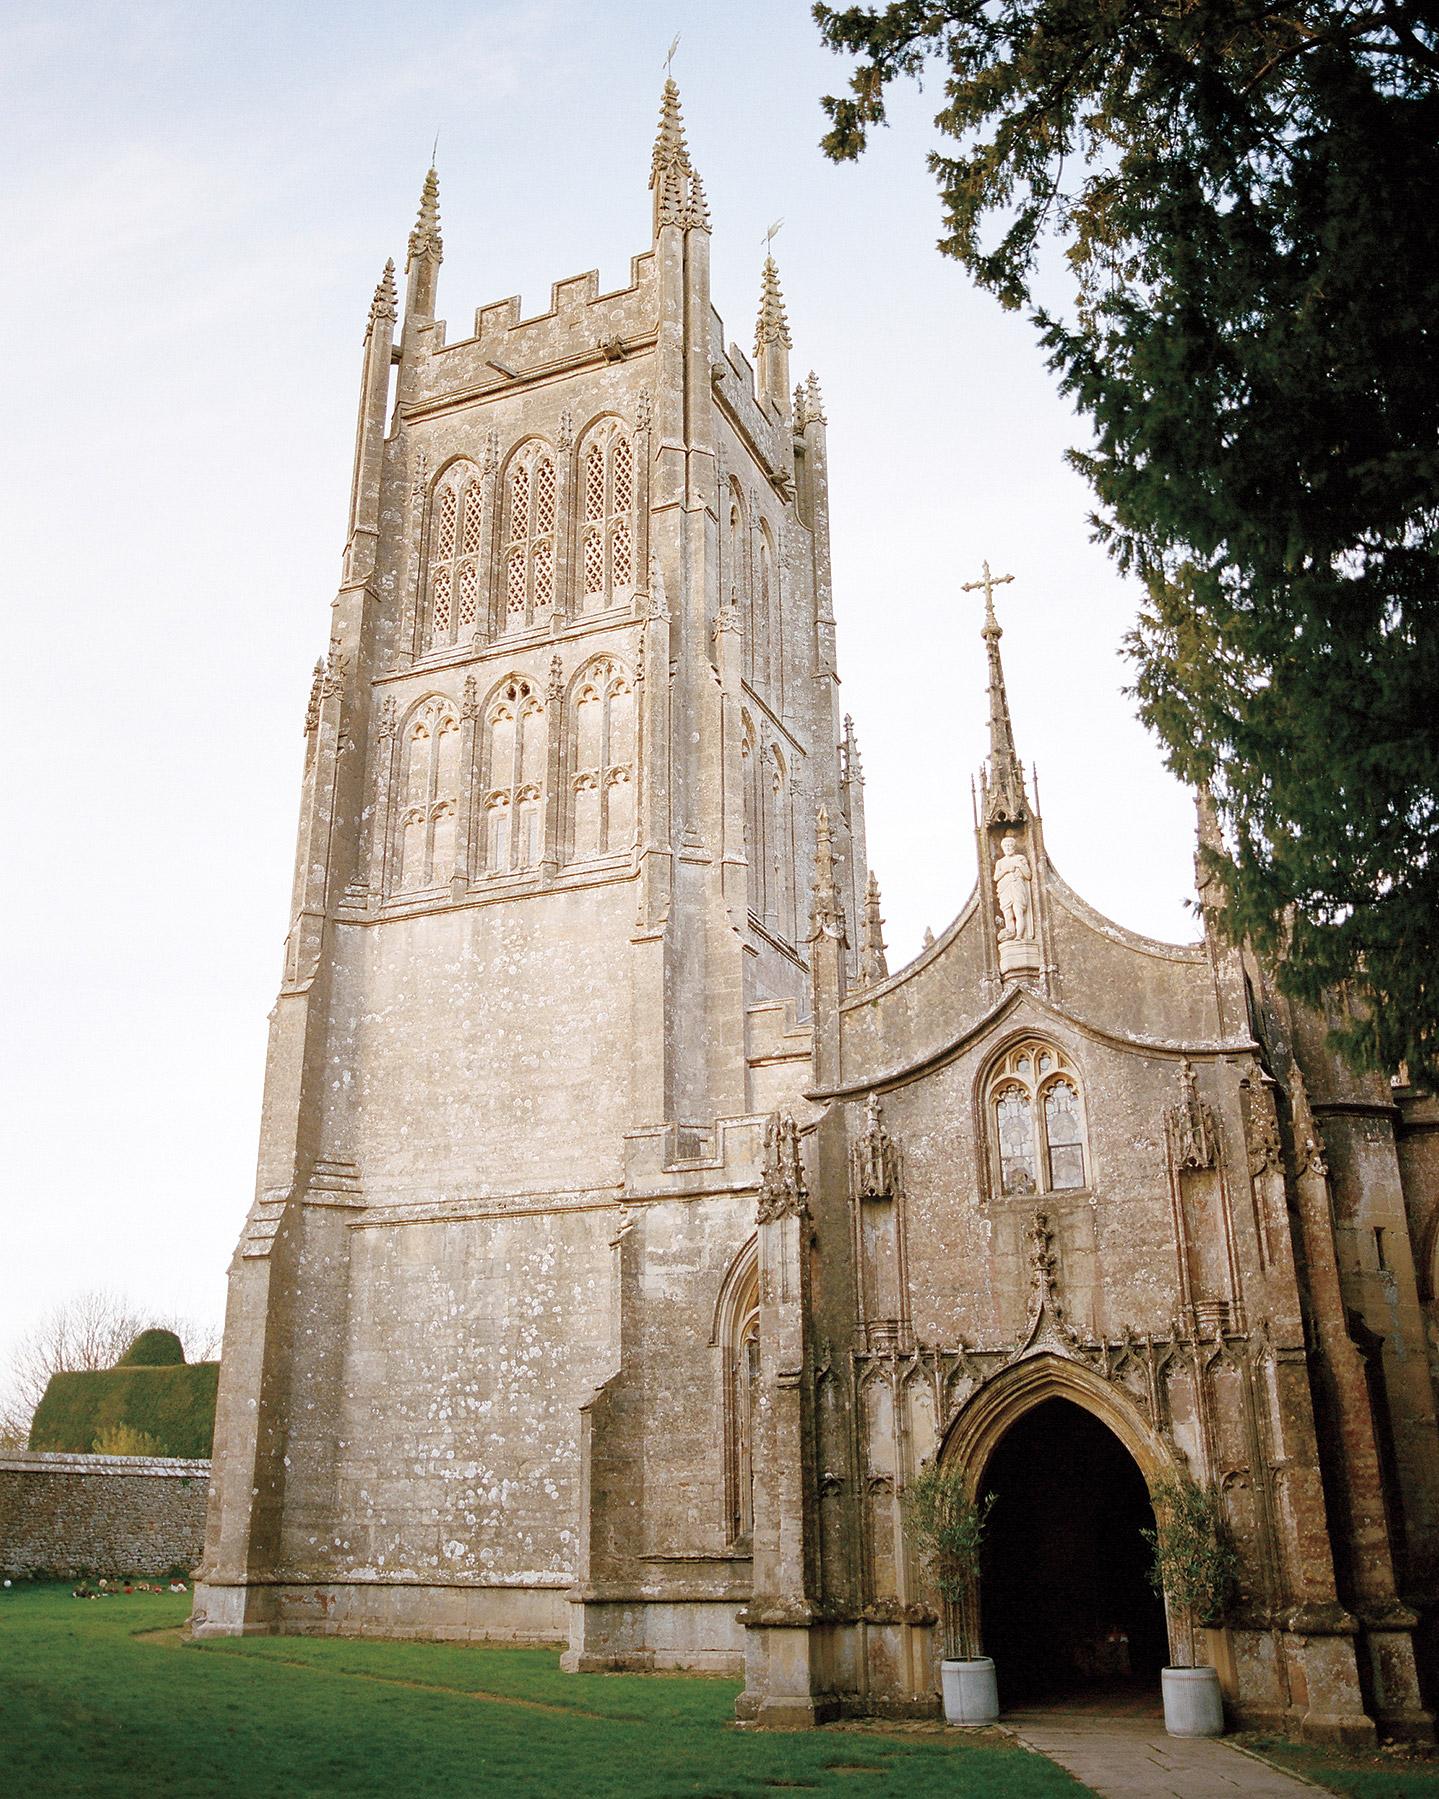 rw-heather-neal-church-ms107641.jpg